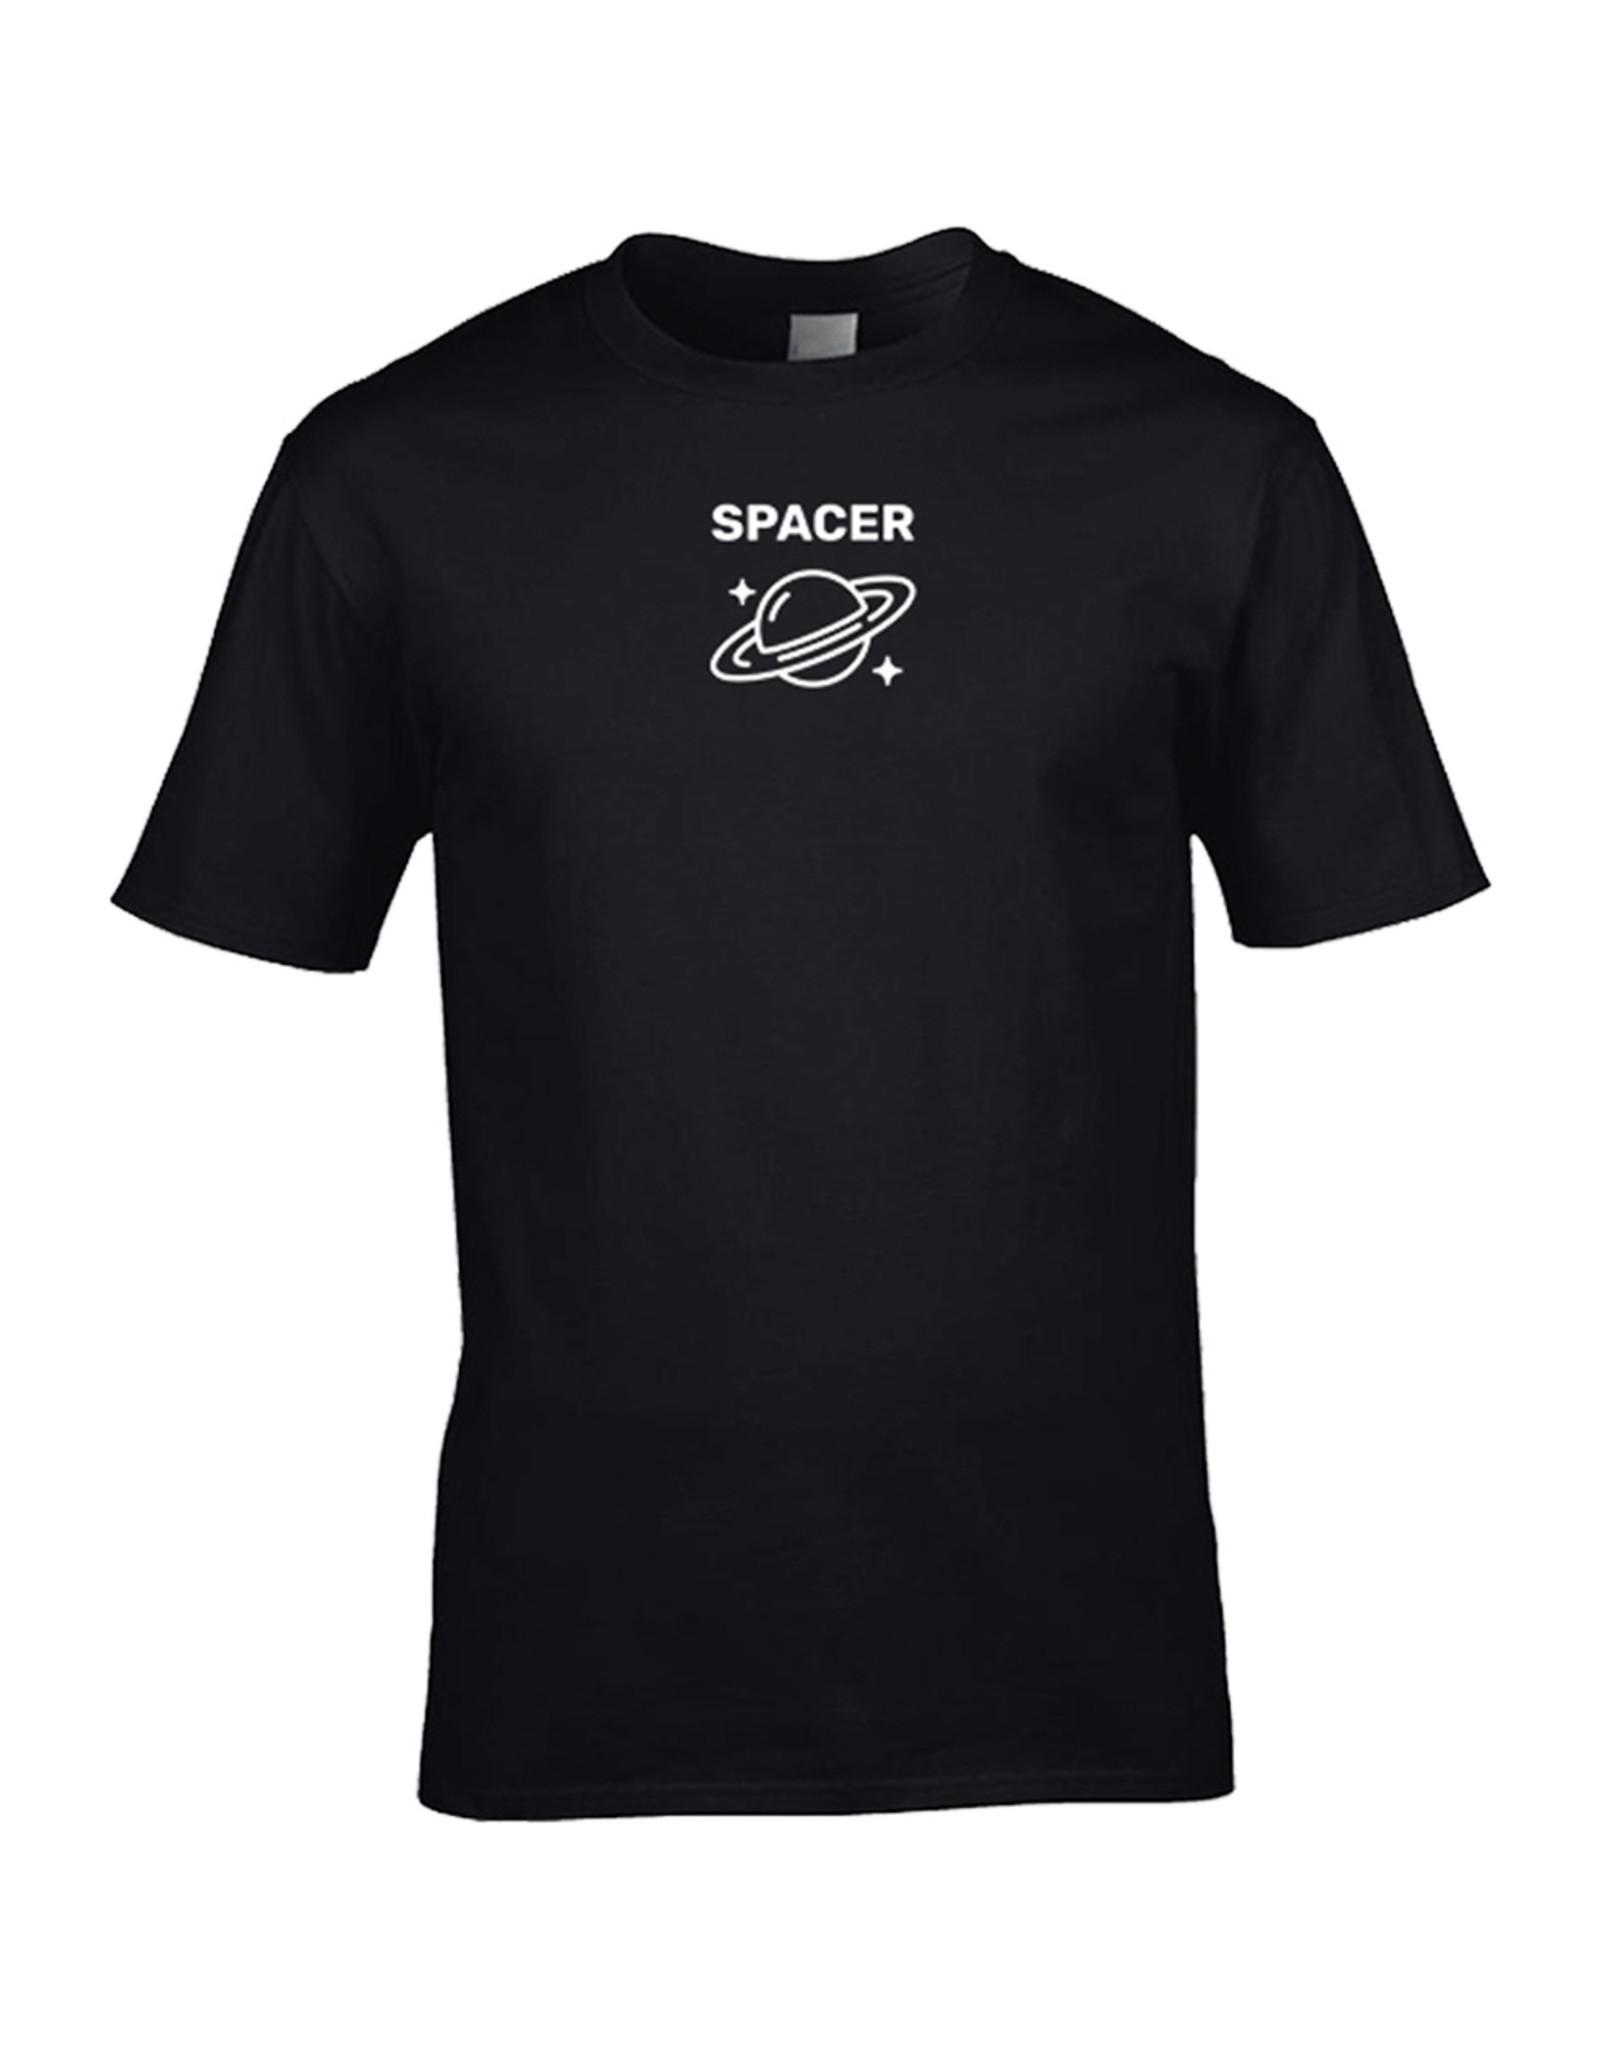 Festicap T-Shirt Spacer | Soft Cotton | Handmade by us